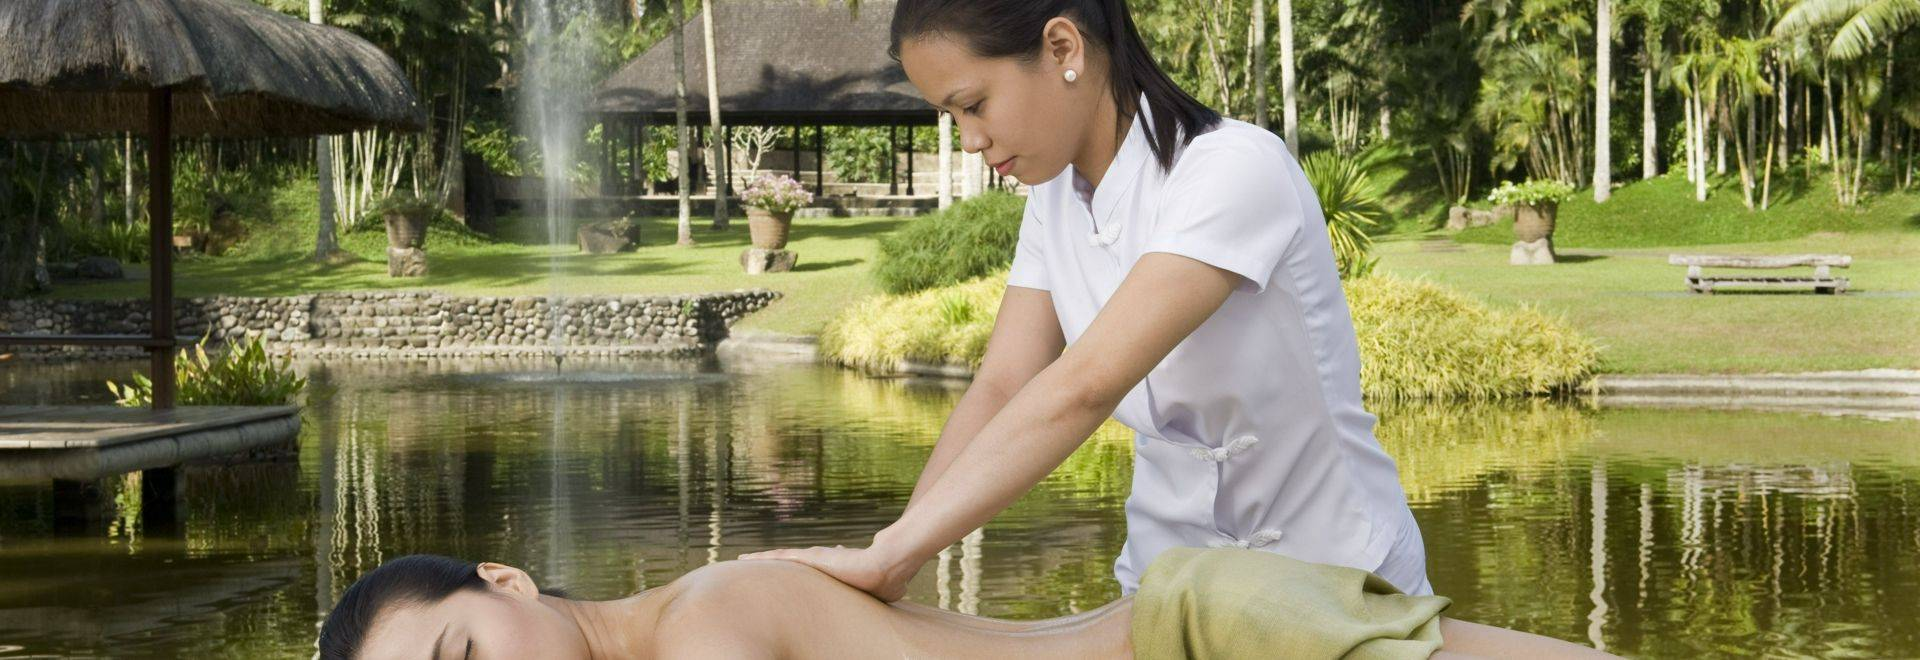 The-Farm-relaxation-massage.jpg